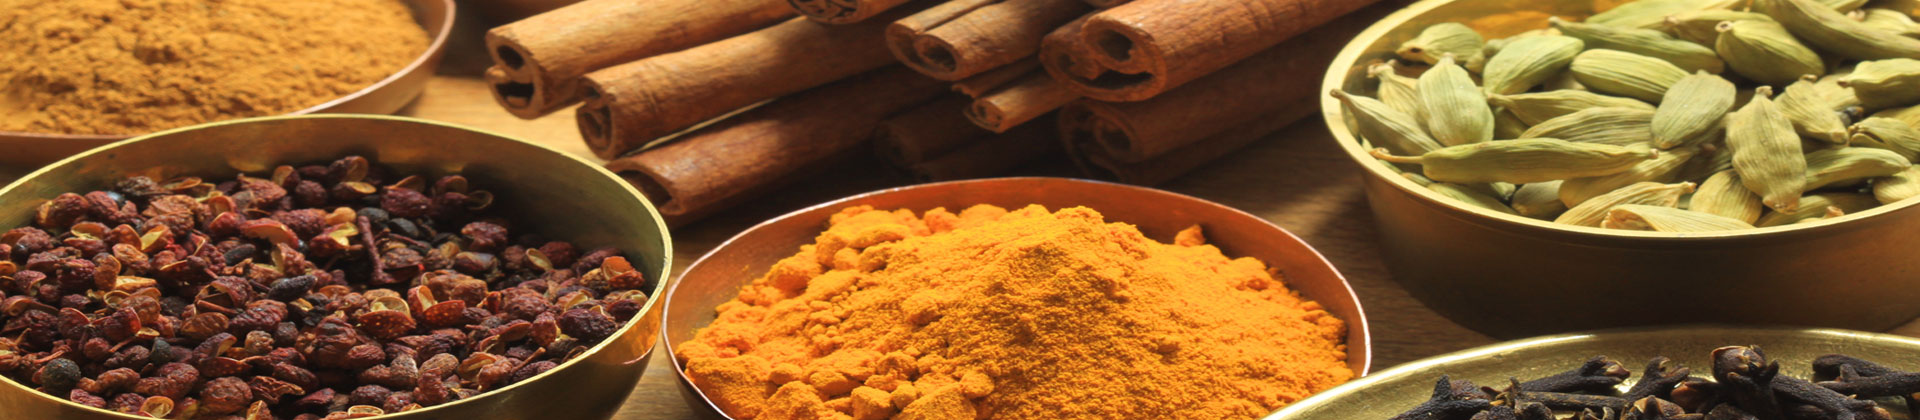 balboa-spices